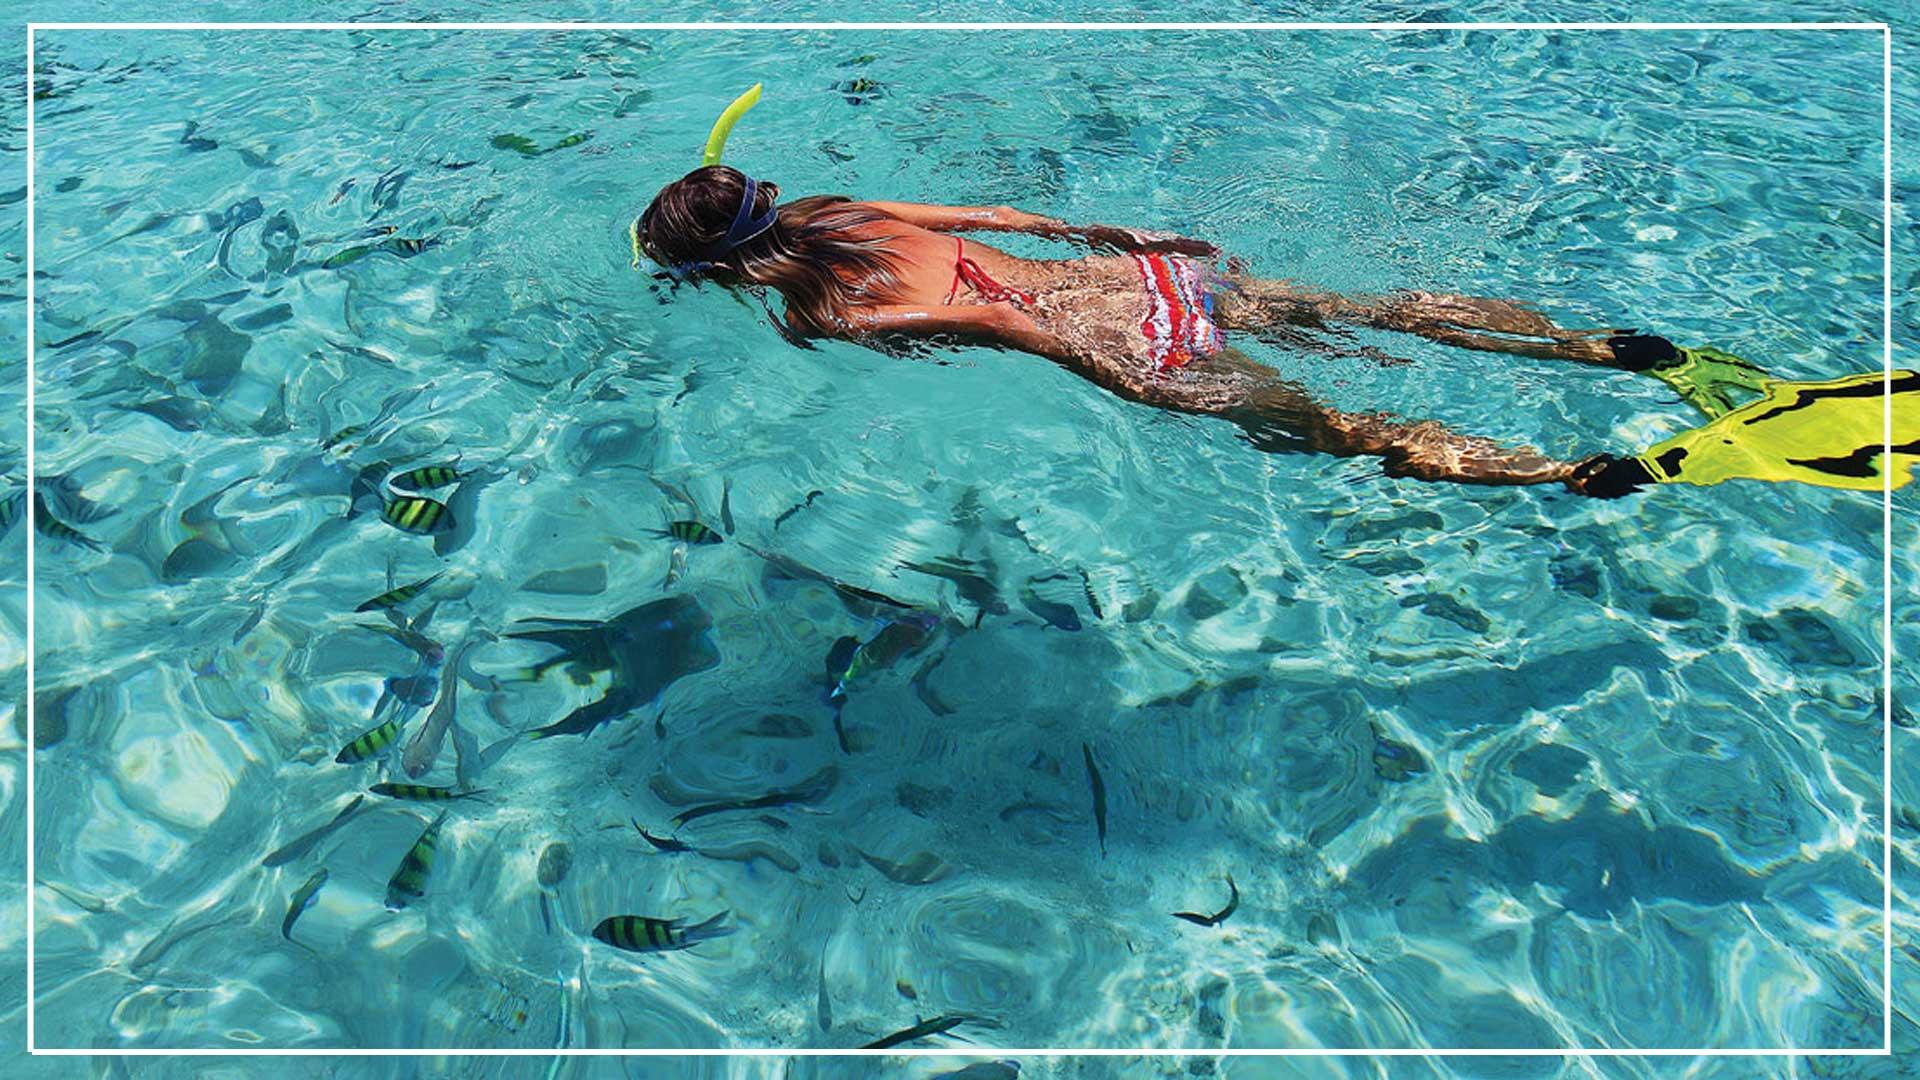 Snorkeling-gili-islands-Lesvillasottalia.jpg